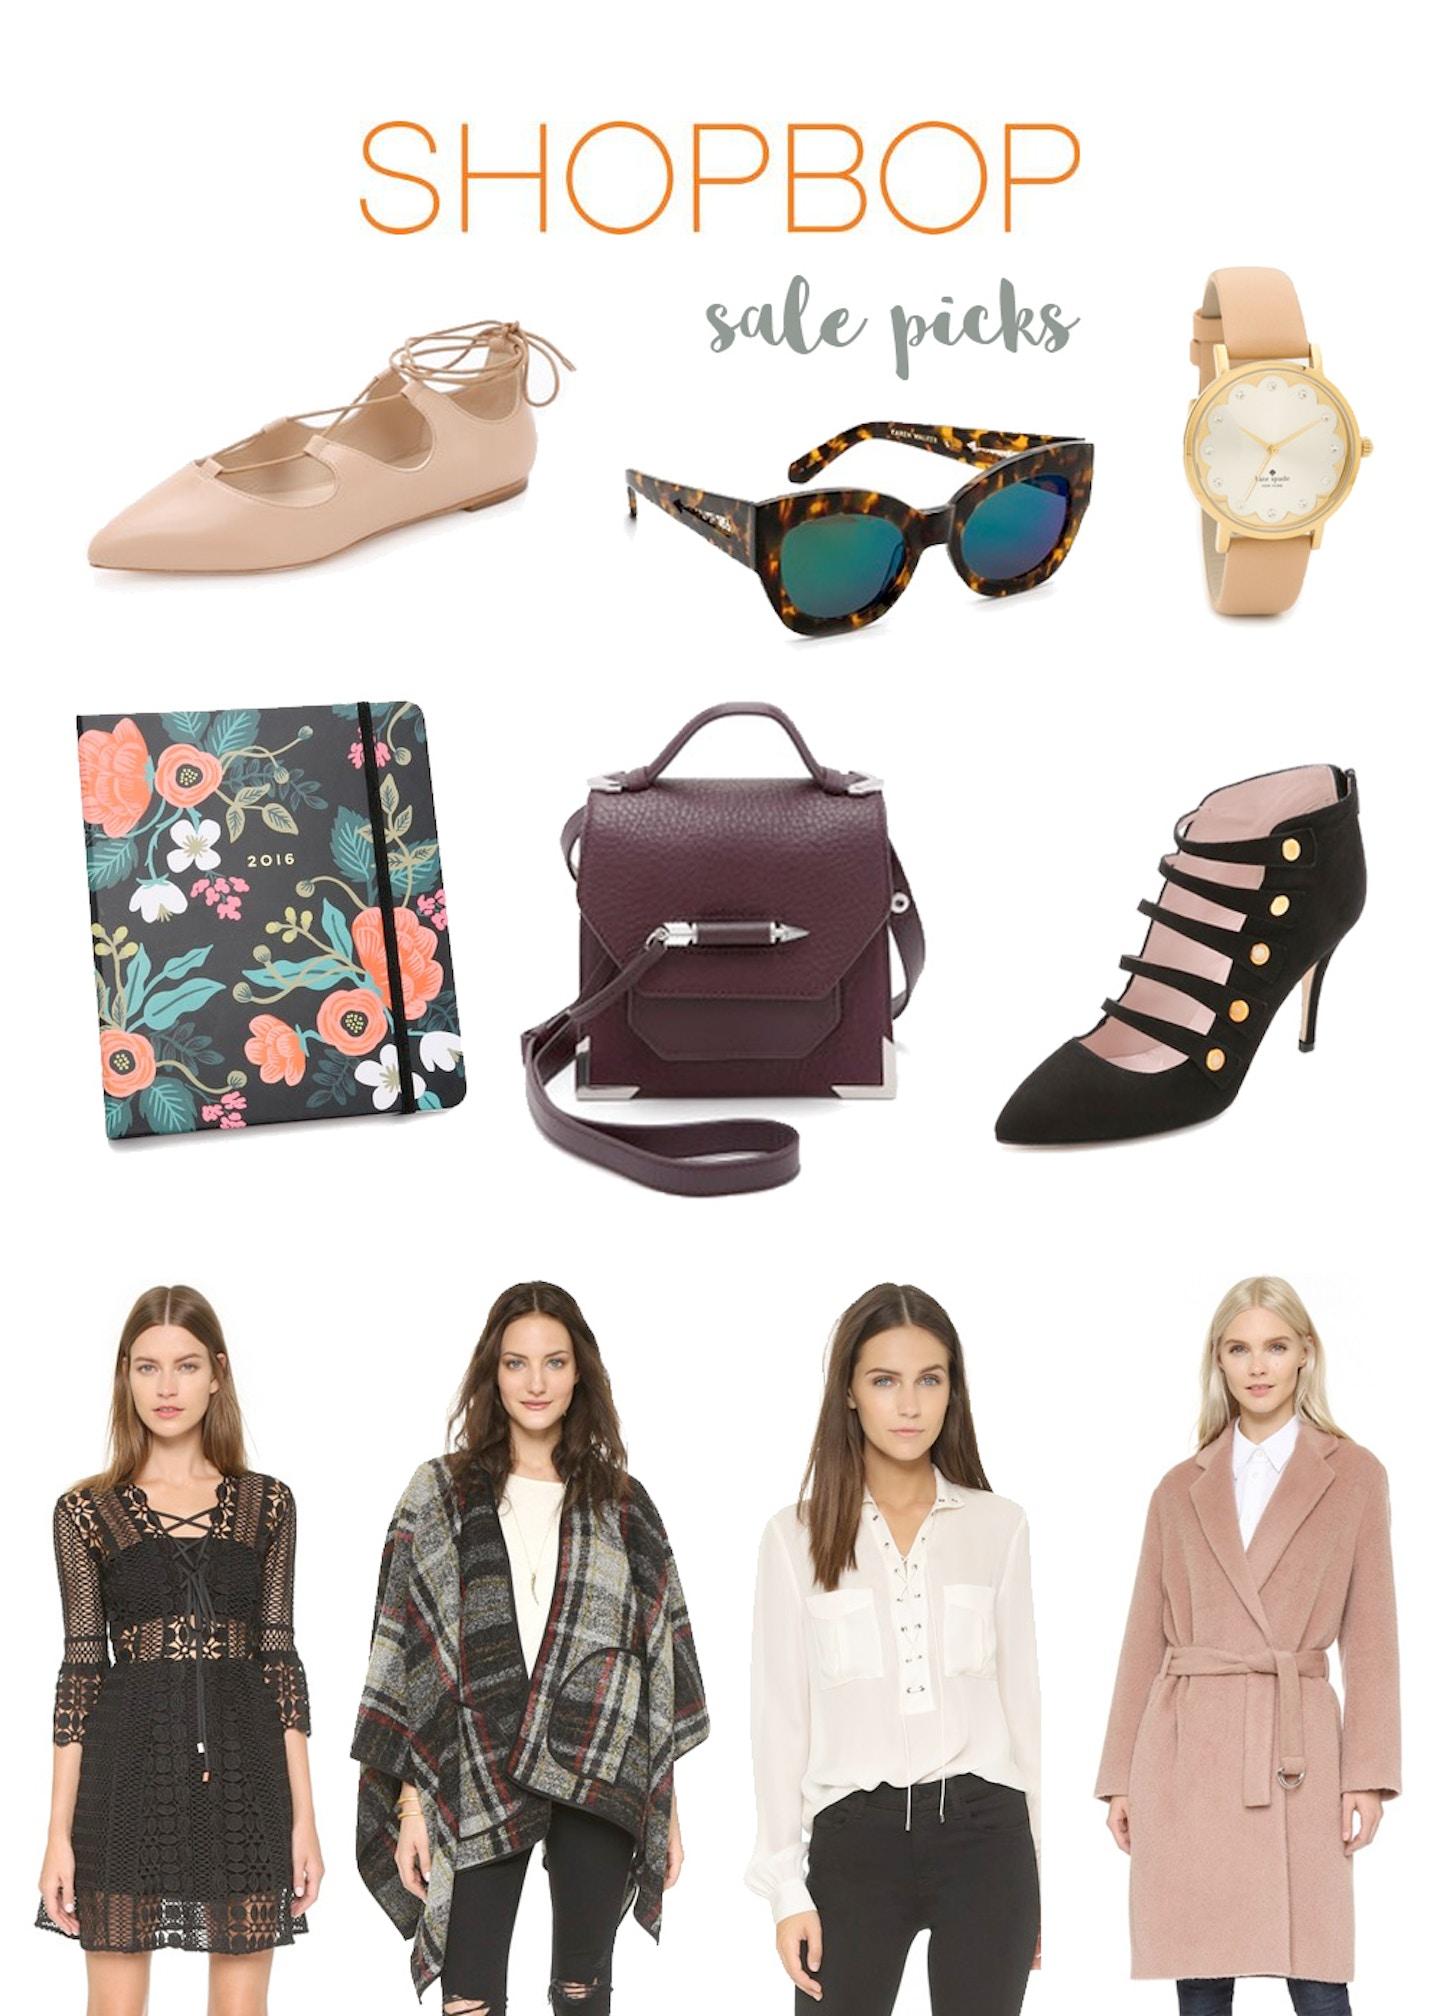 Shopbop Friends & Family Sale 2015 Picks